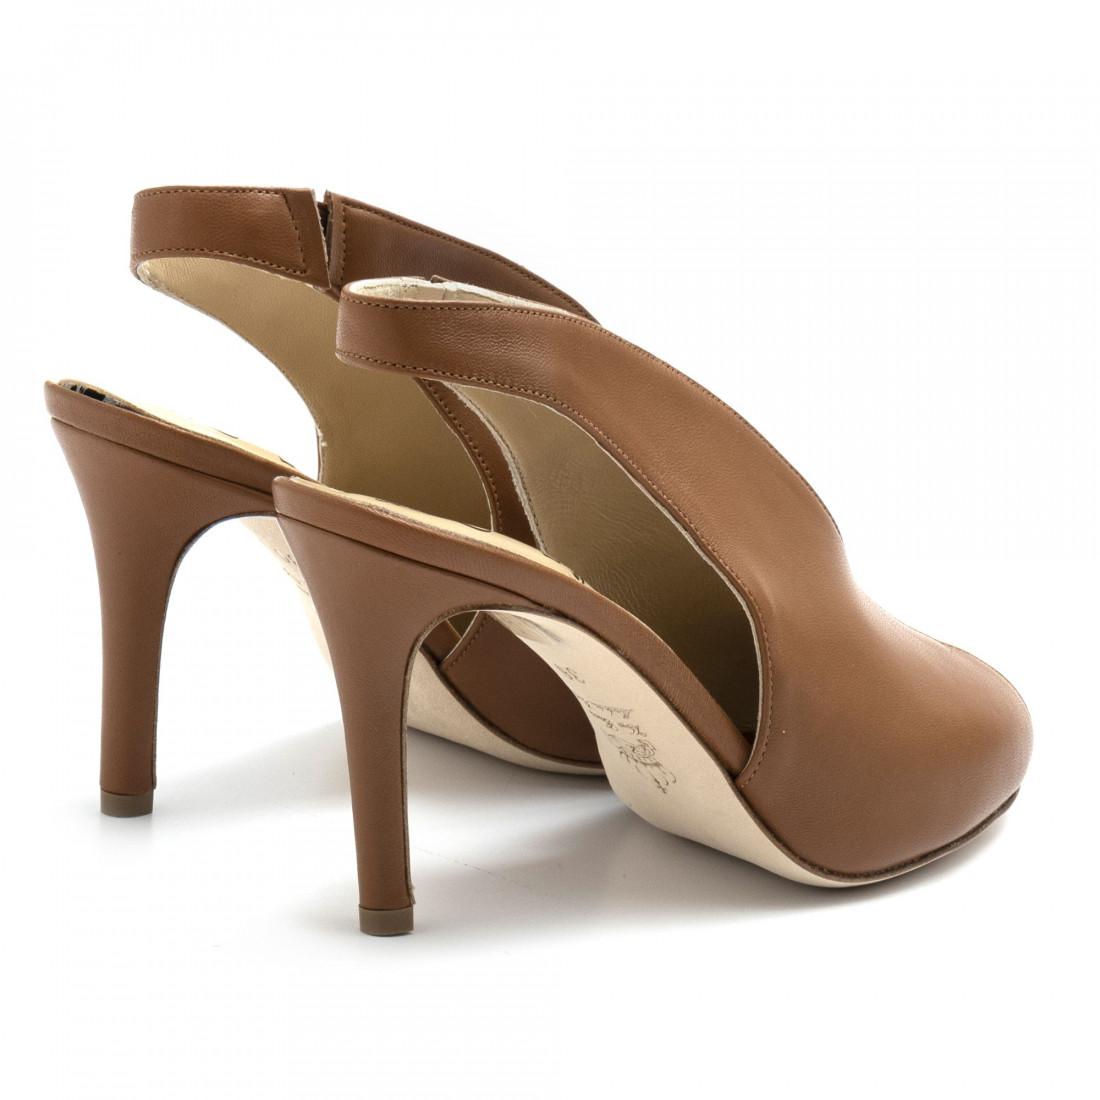 sandals woman larianna sp 8017seta cuoio 4902